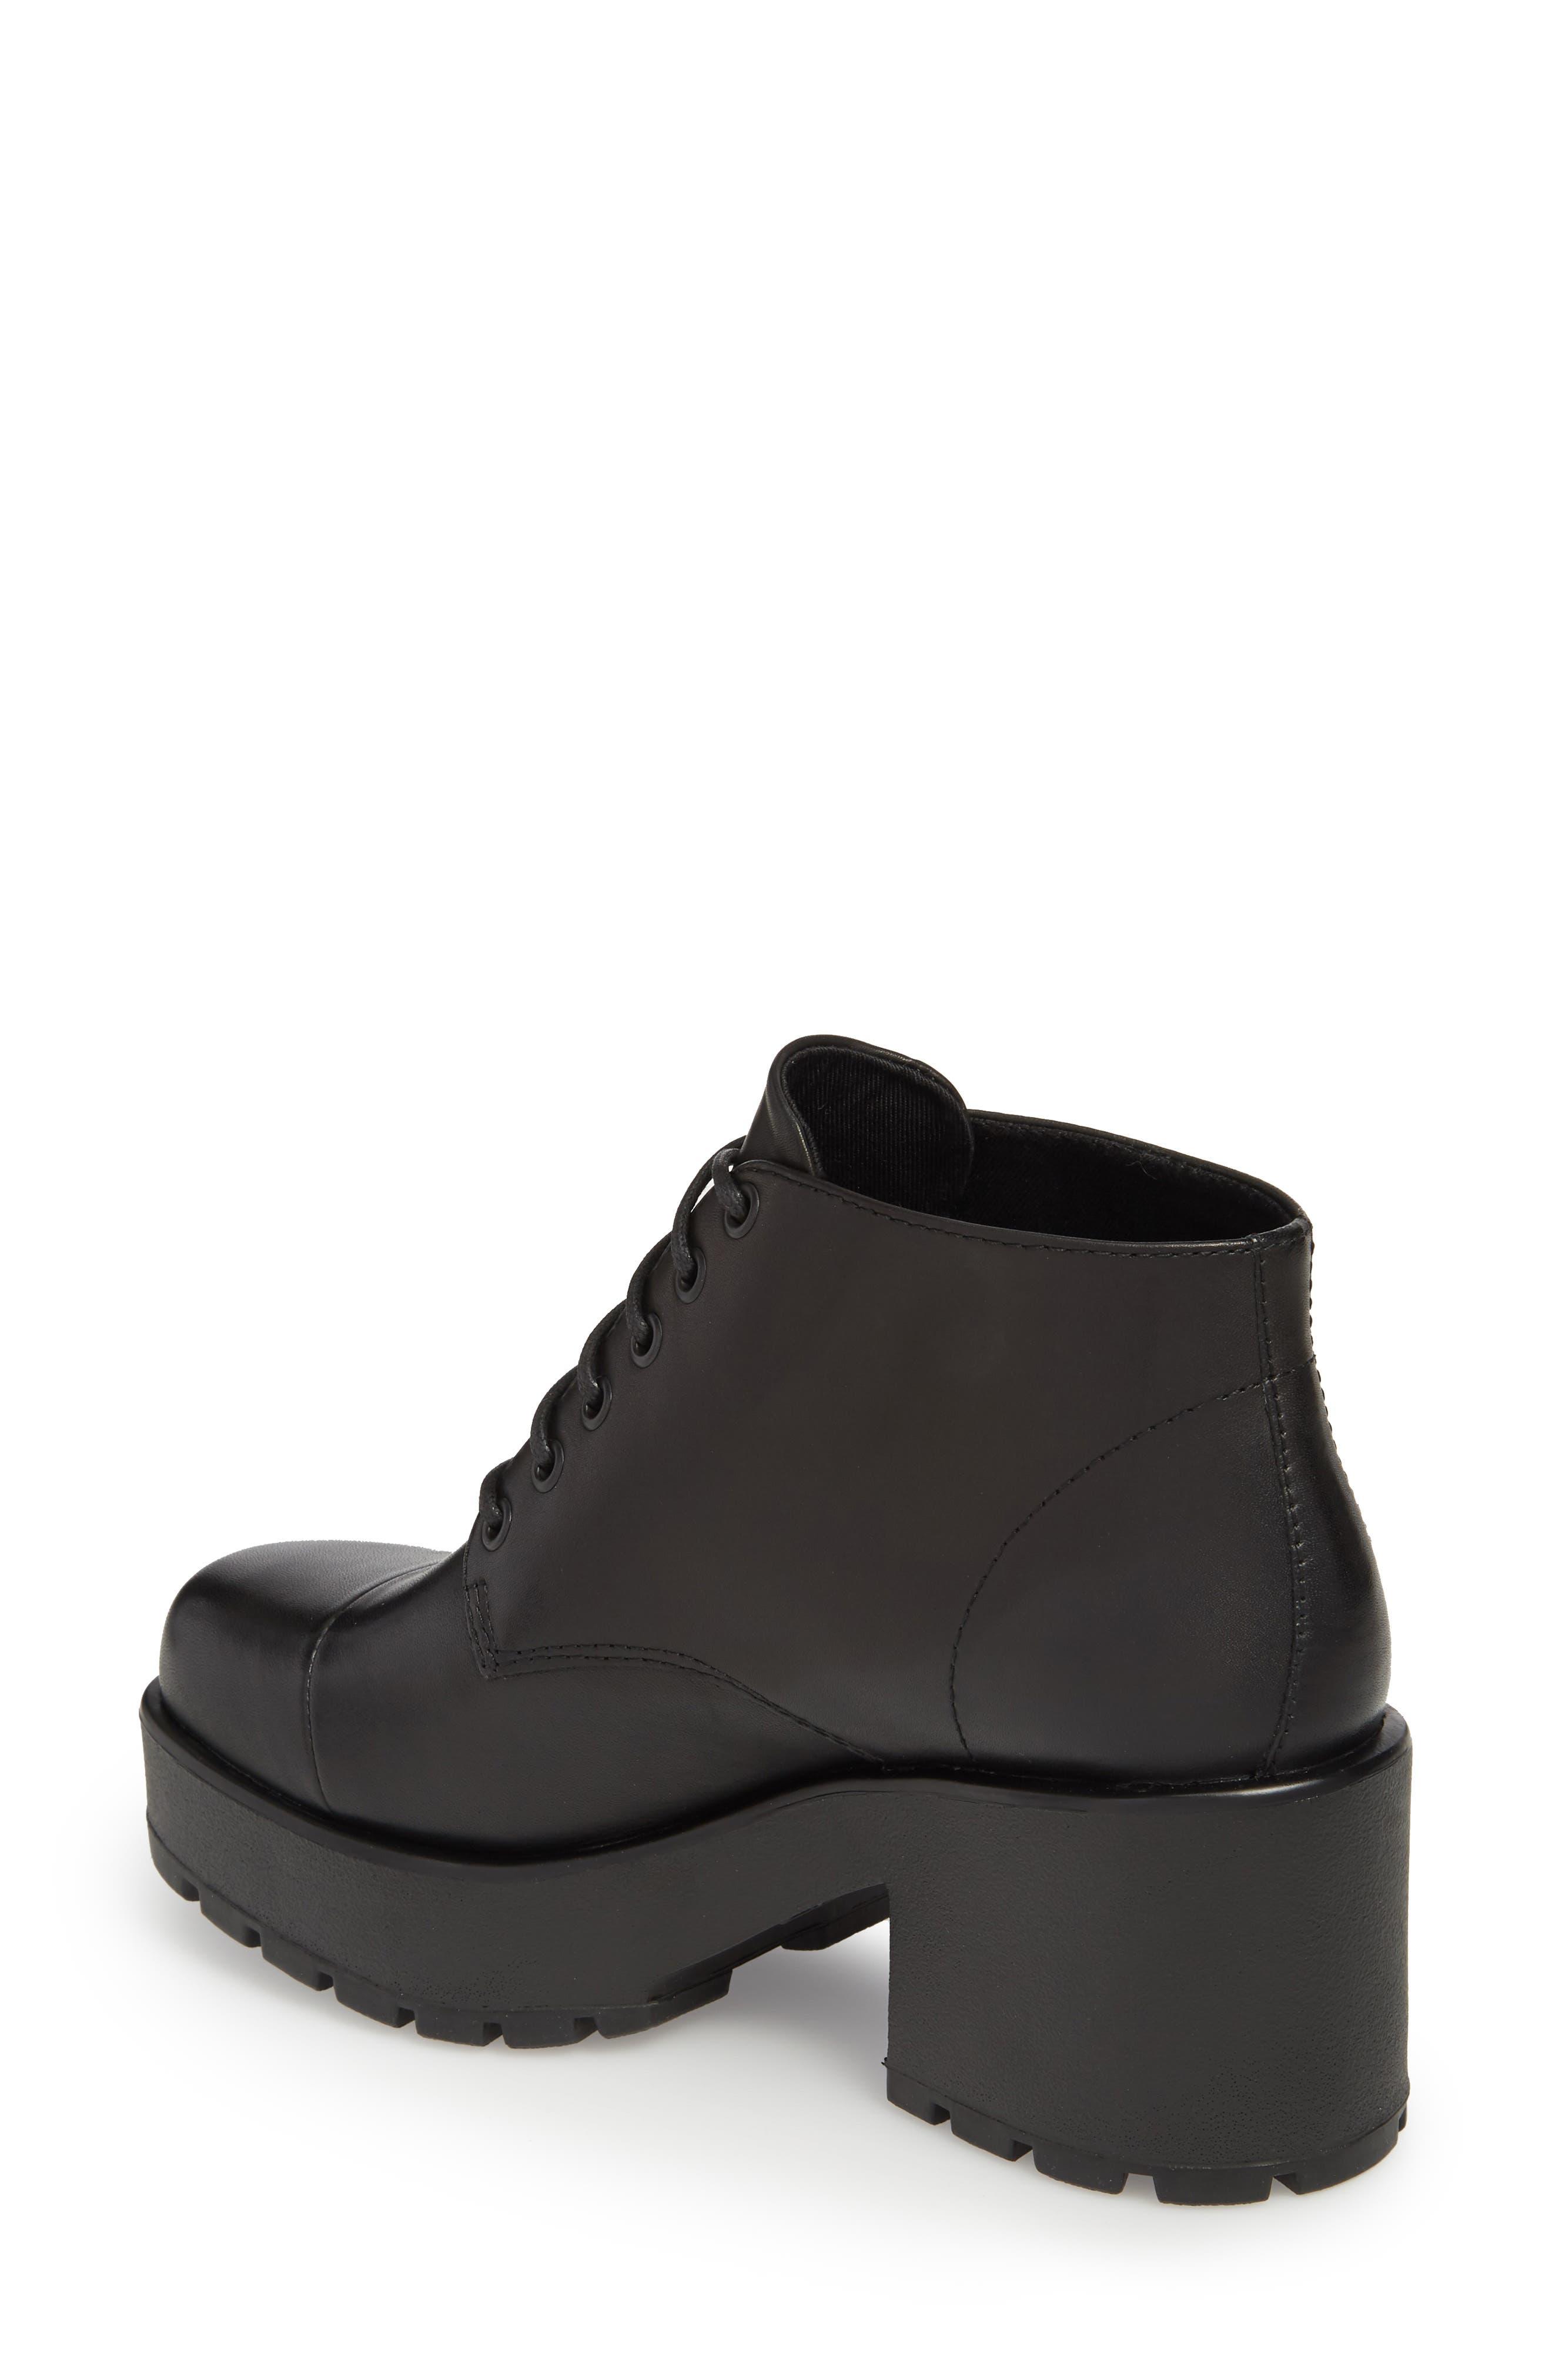 VAGABOND,                             Shoemakers Dioon Cap Toe Bootie,                             Alternate thumbnail 2, color,                             BLACK LEATHER